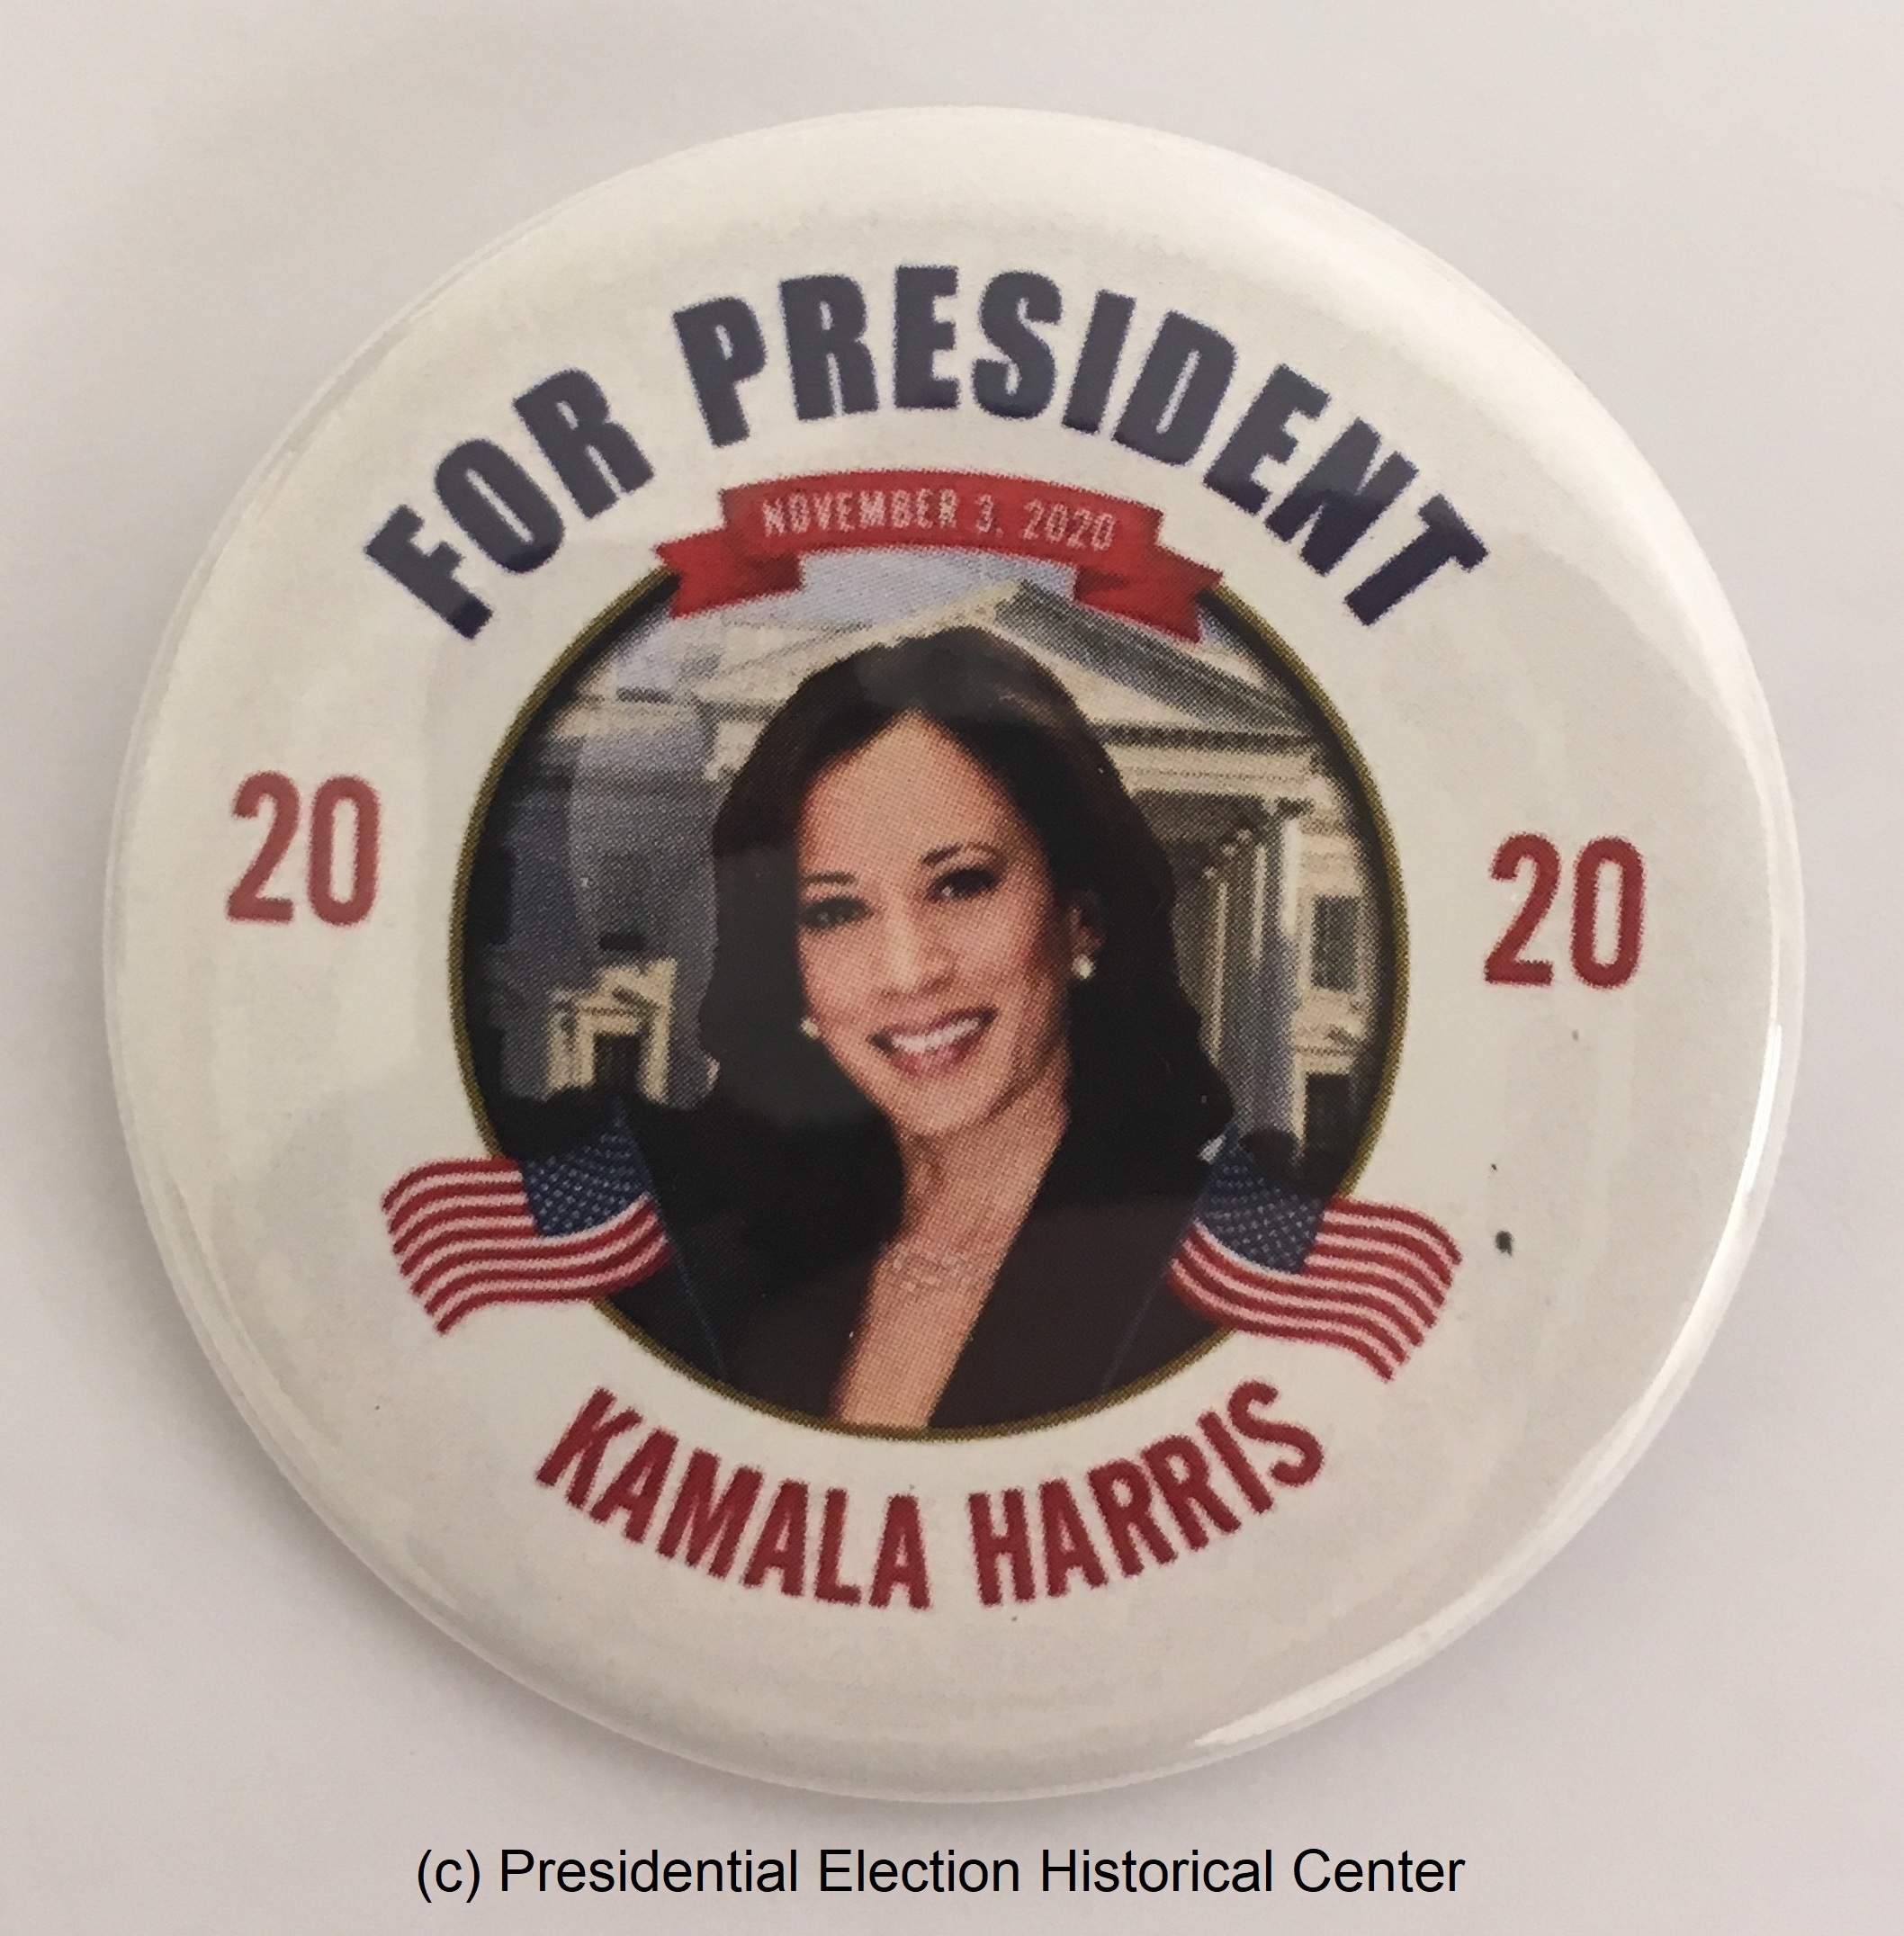 2020 Kamala Harris for PRESIDENT CAMPAIGN BUTTON PIN PINBACK